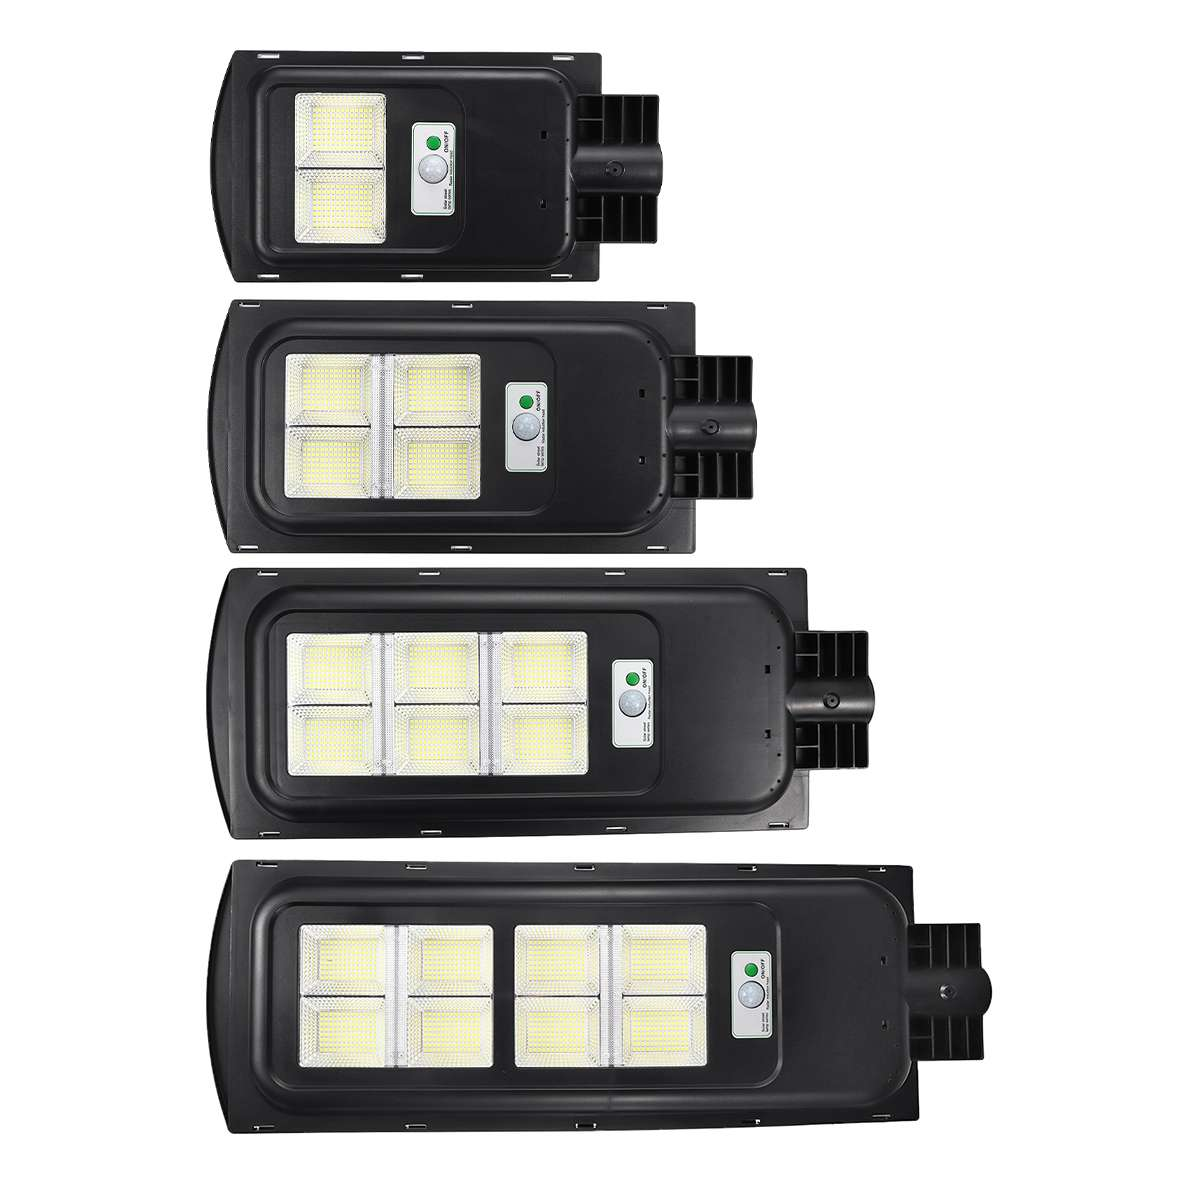 Polycrystalline 208/416/624/832 LED Solar Street Light Wall Light Outdoor Garden Street Pathway Lamp Waterproof Road Floodlight